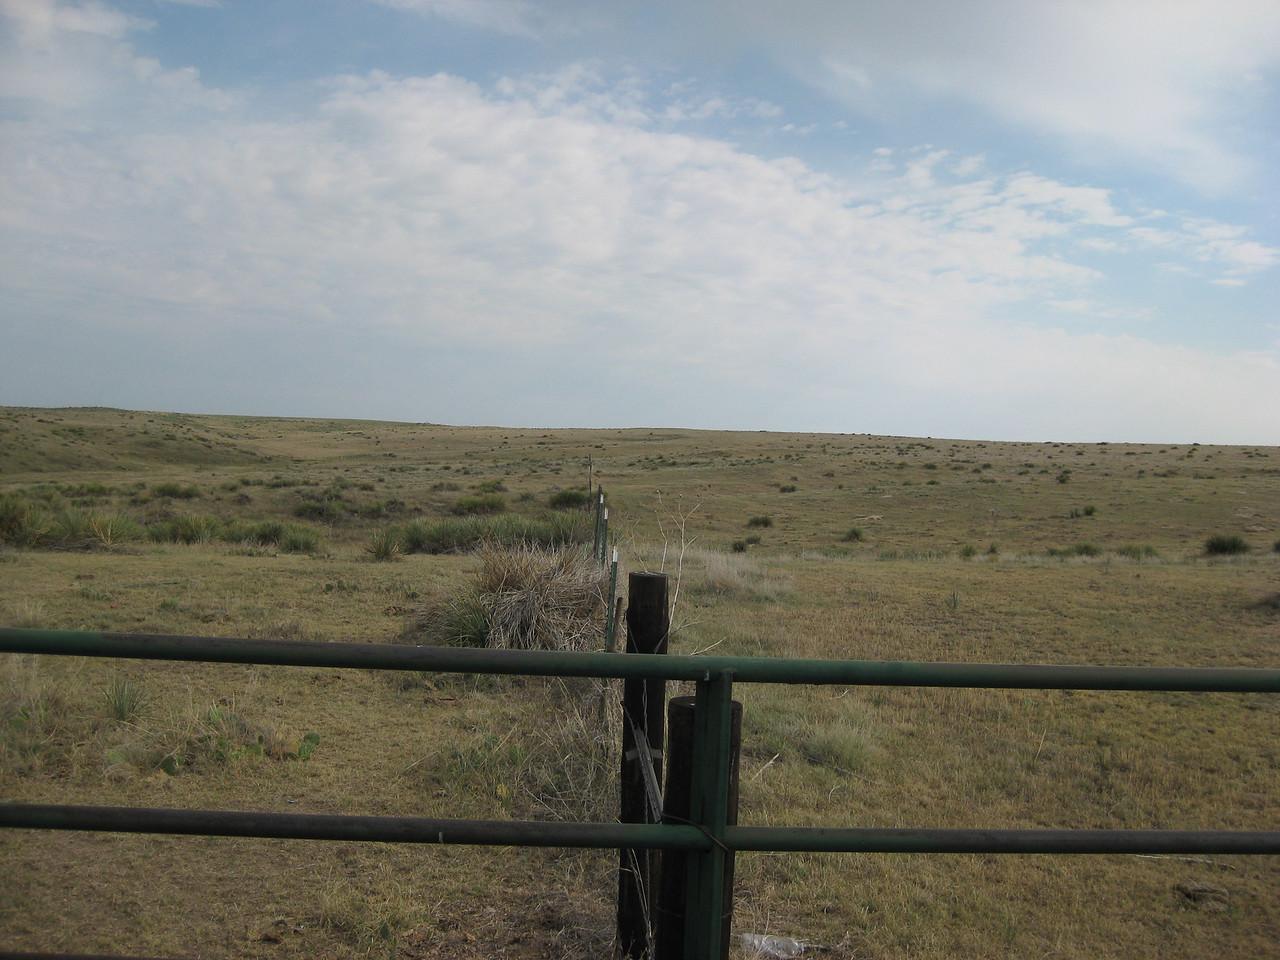 GPS Field Campaign, Rio Grande Rift Project, Eastern Colorado, July 2008<br /> <br /> Boundary Mon Co KS NE, 40.0032, -102.052<br /> <br /> Looking North